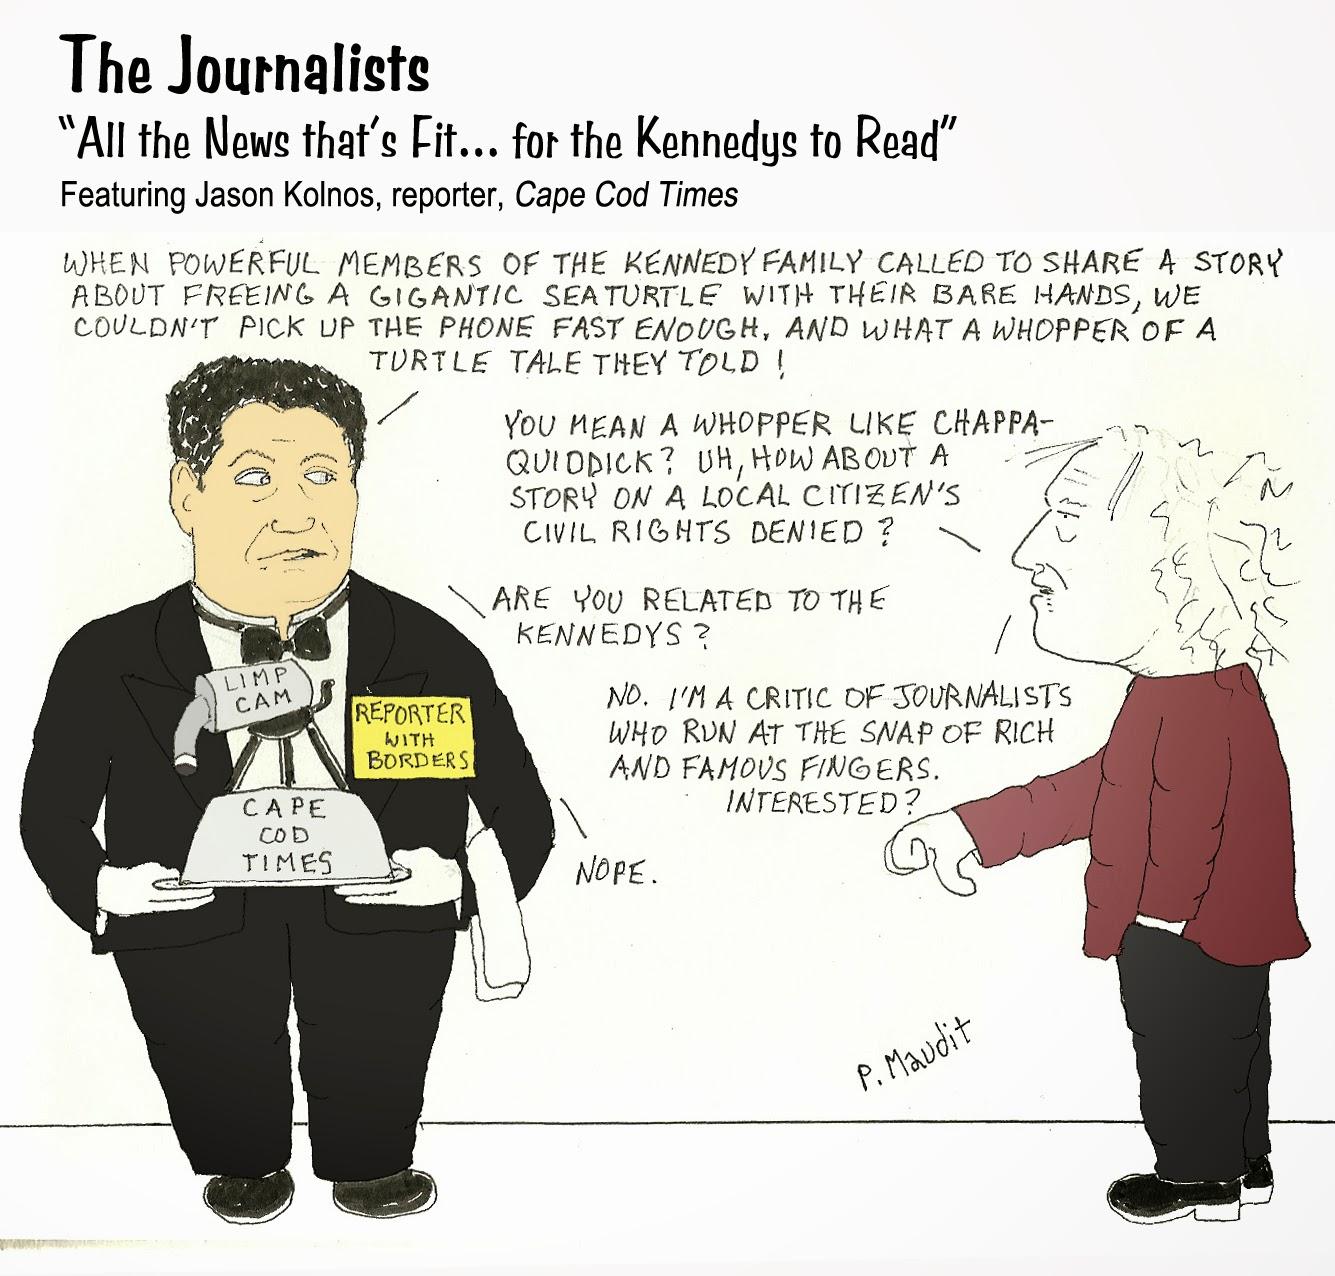 The American Dissident: Jason Kolnos